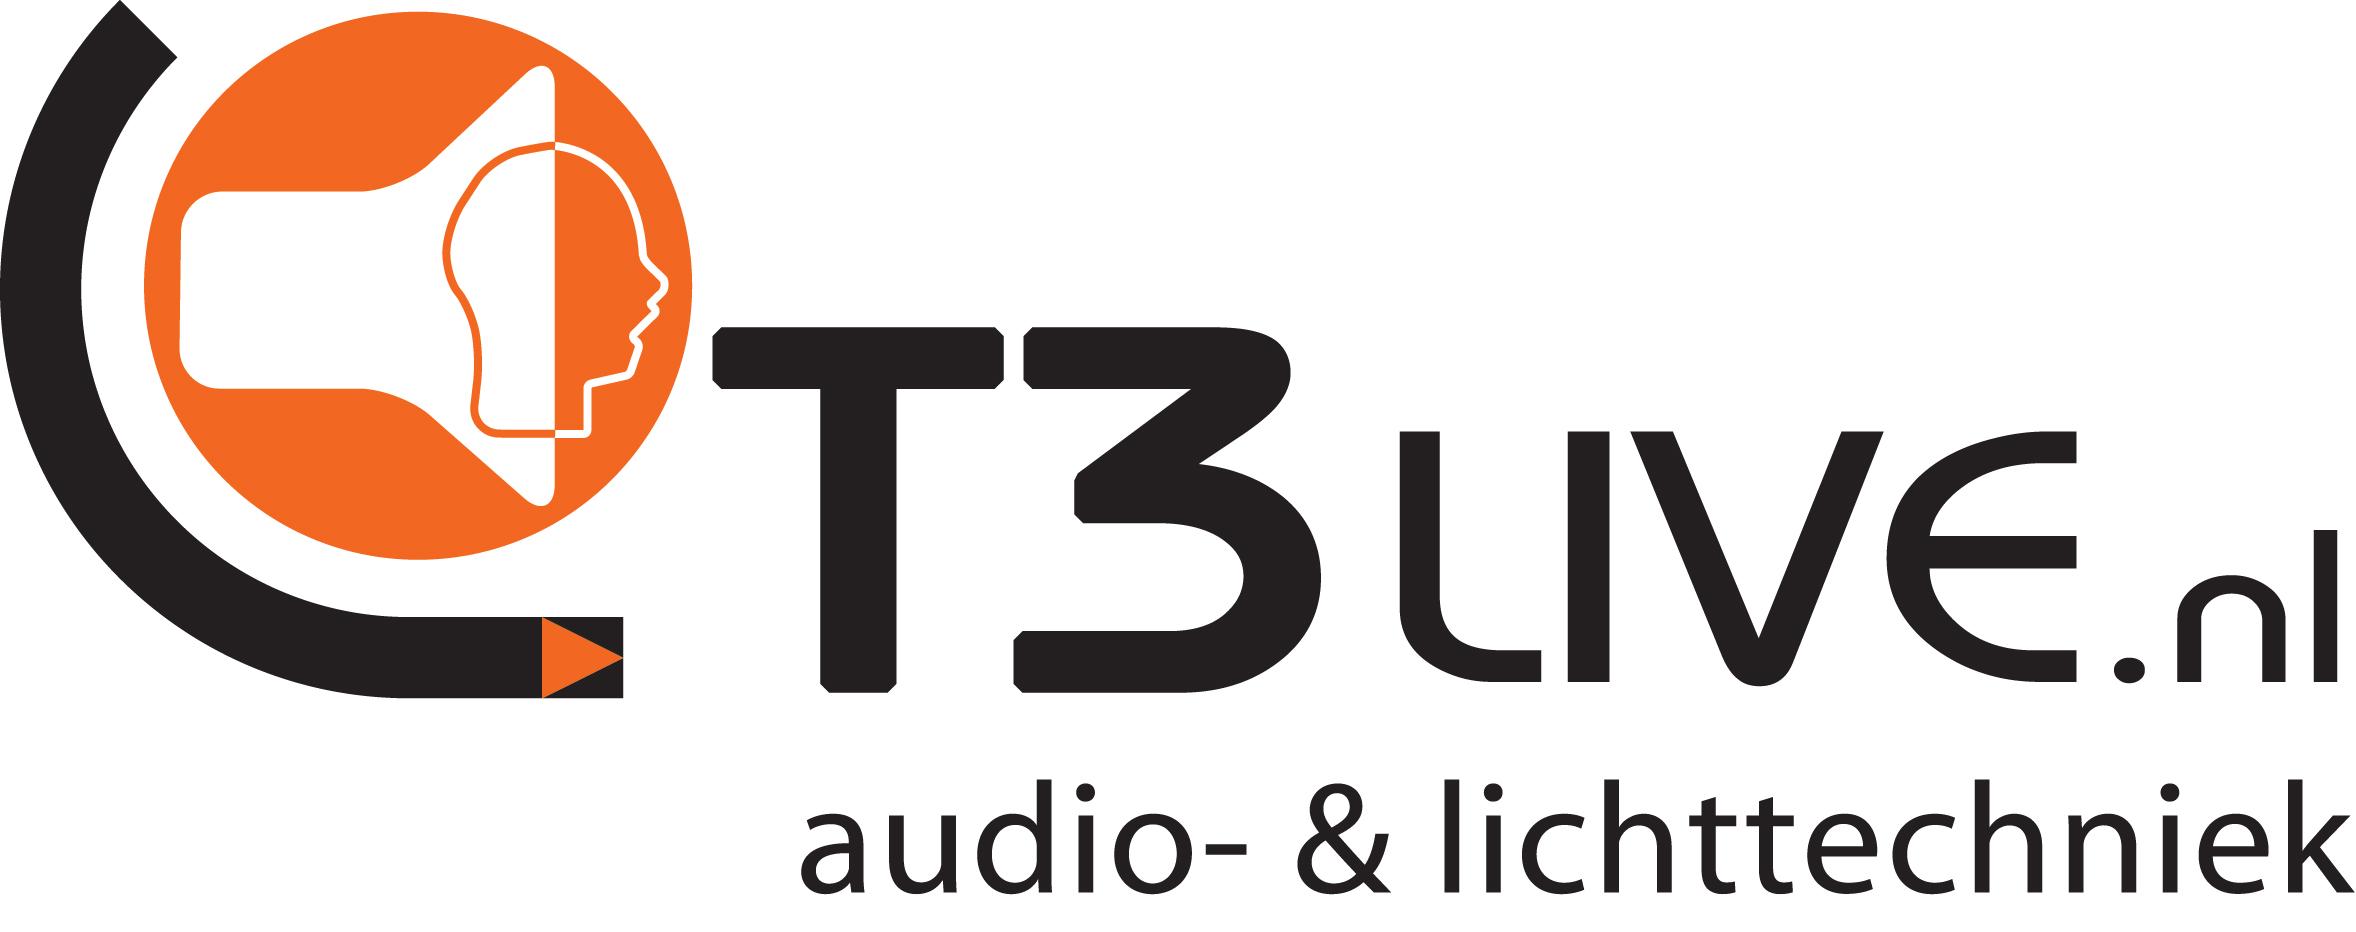 Logo-T3Live